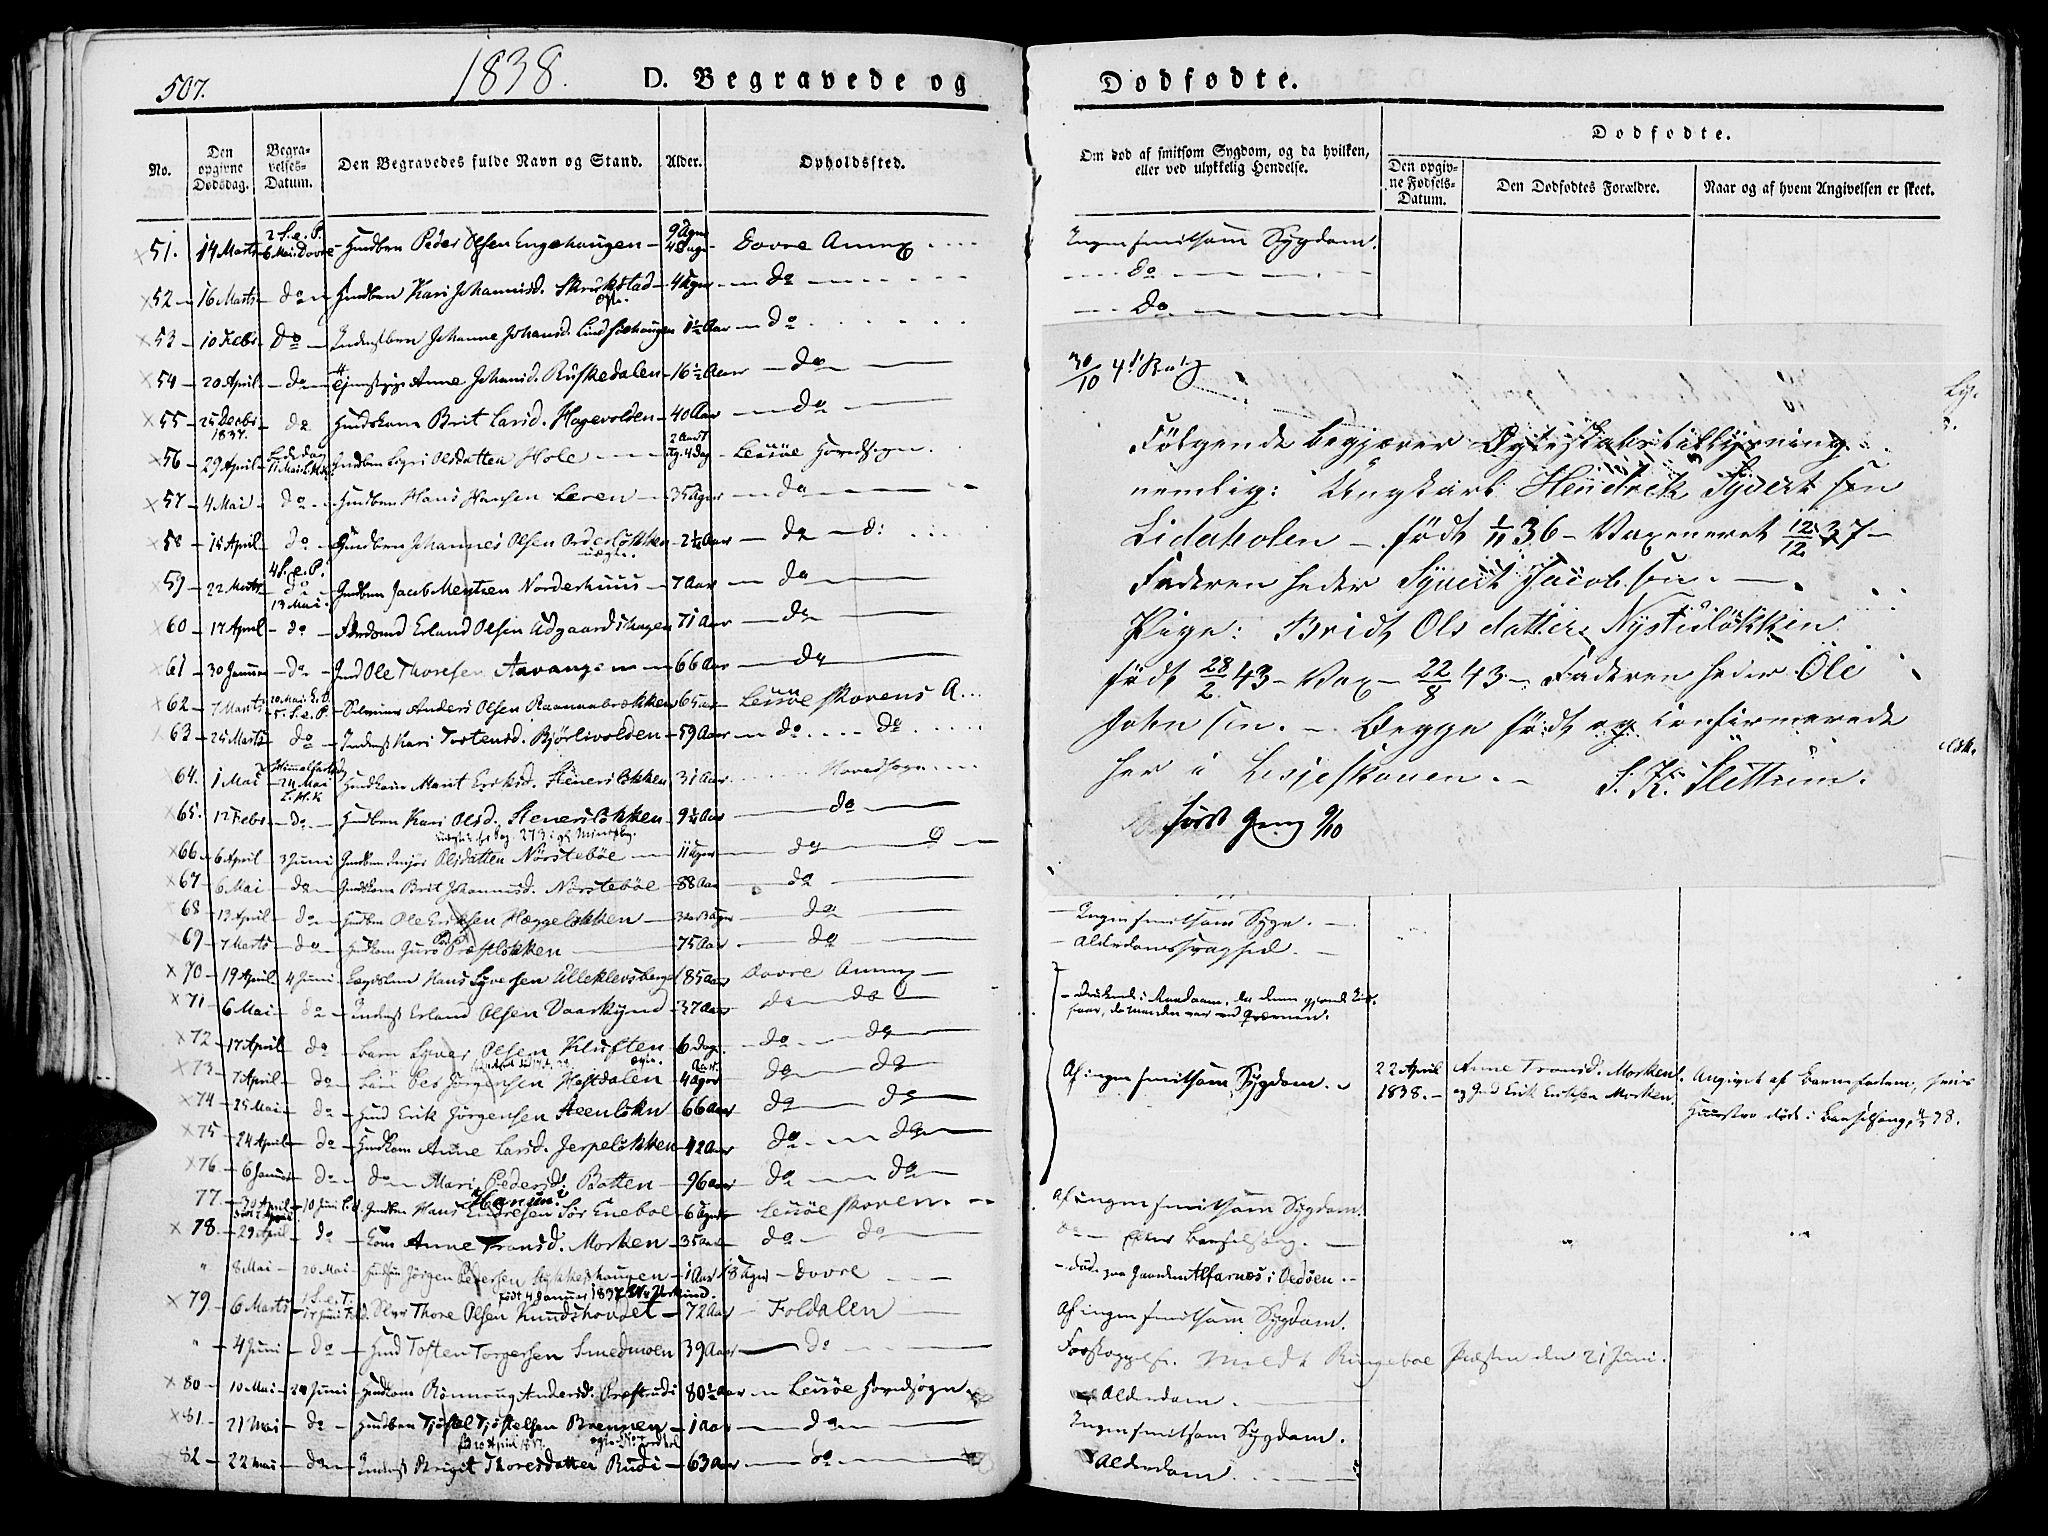 SAH, Lesja prestekontor, Ministerialbok nr. 5, 1830-1842, s. 507